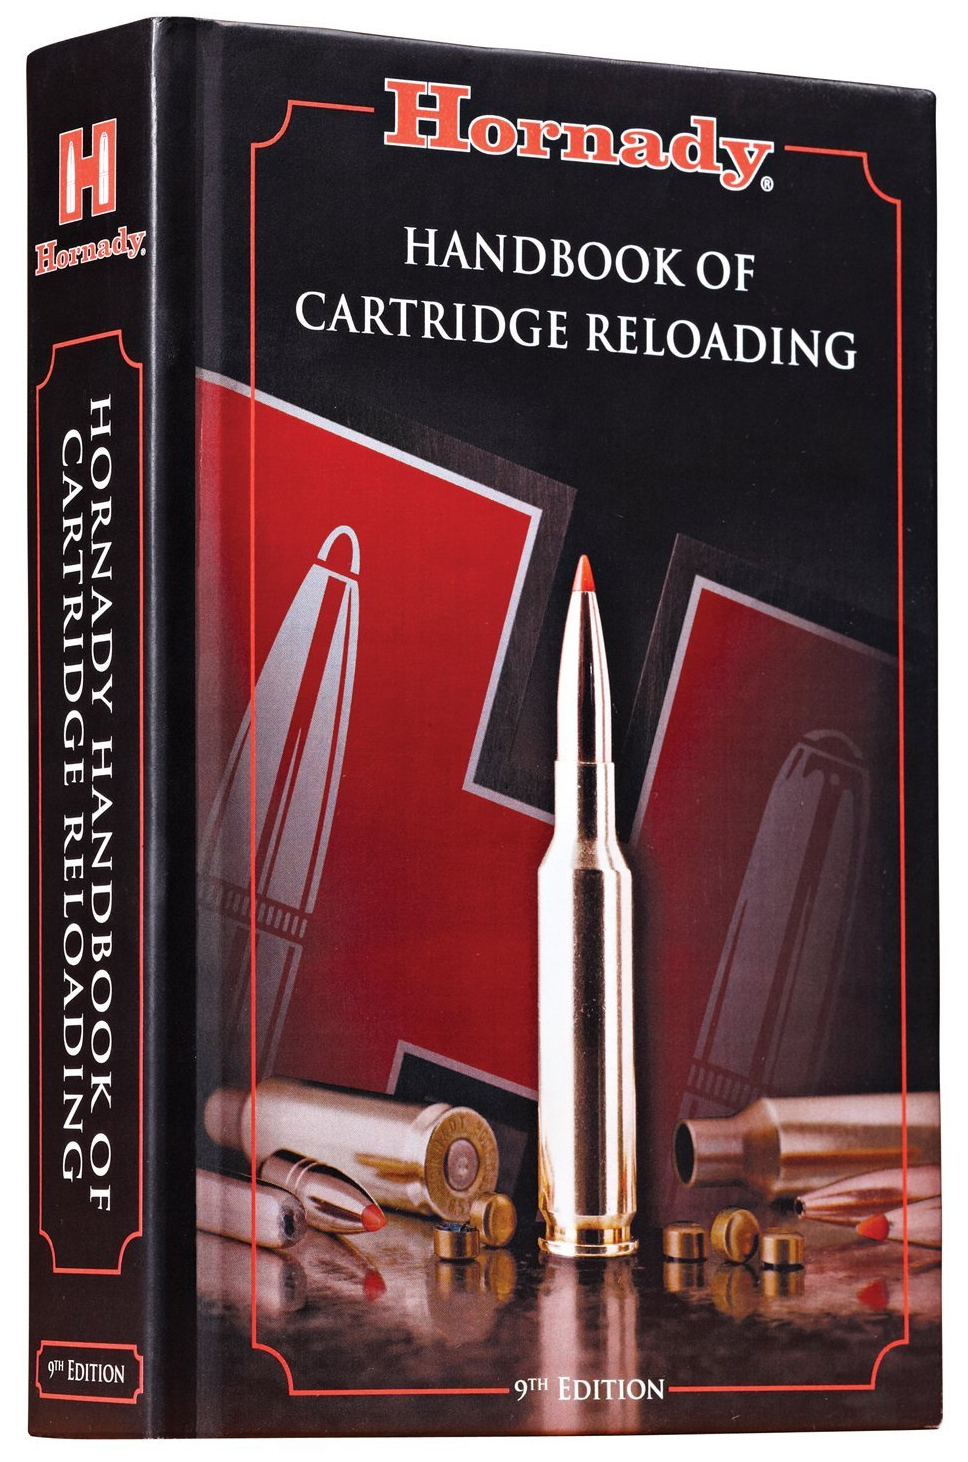 hornady handbook of cartridge reloading 9th edition revivaler rh revivaler com hornady reloading manual 8th edition hornady reloading handbook 9th edition pdf